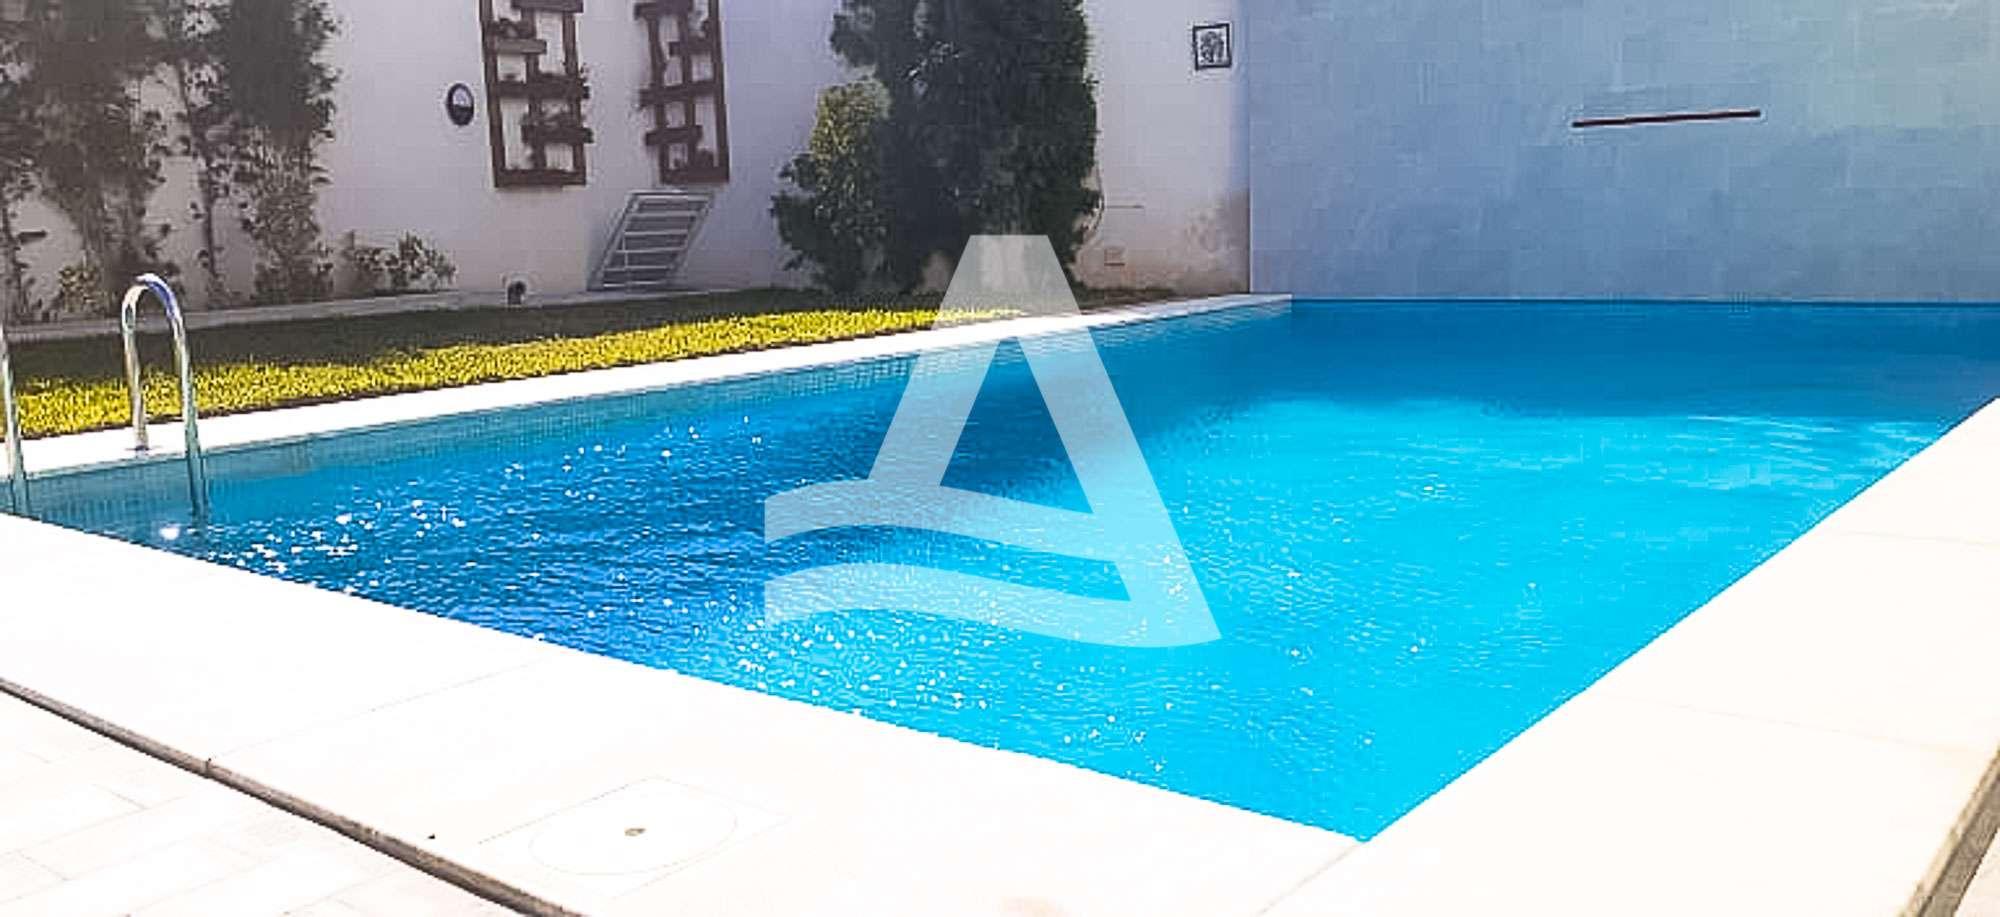 httpss3.amazonaws.comlogimoaws_Arcane_immobilière_la_Marsa-_location_-_vente_la_marsa_6_sur_21_1574354370801-1